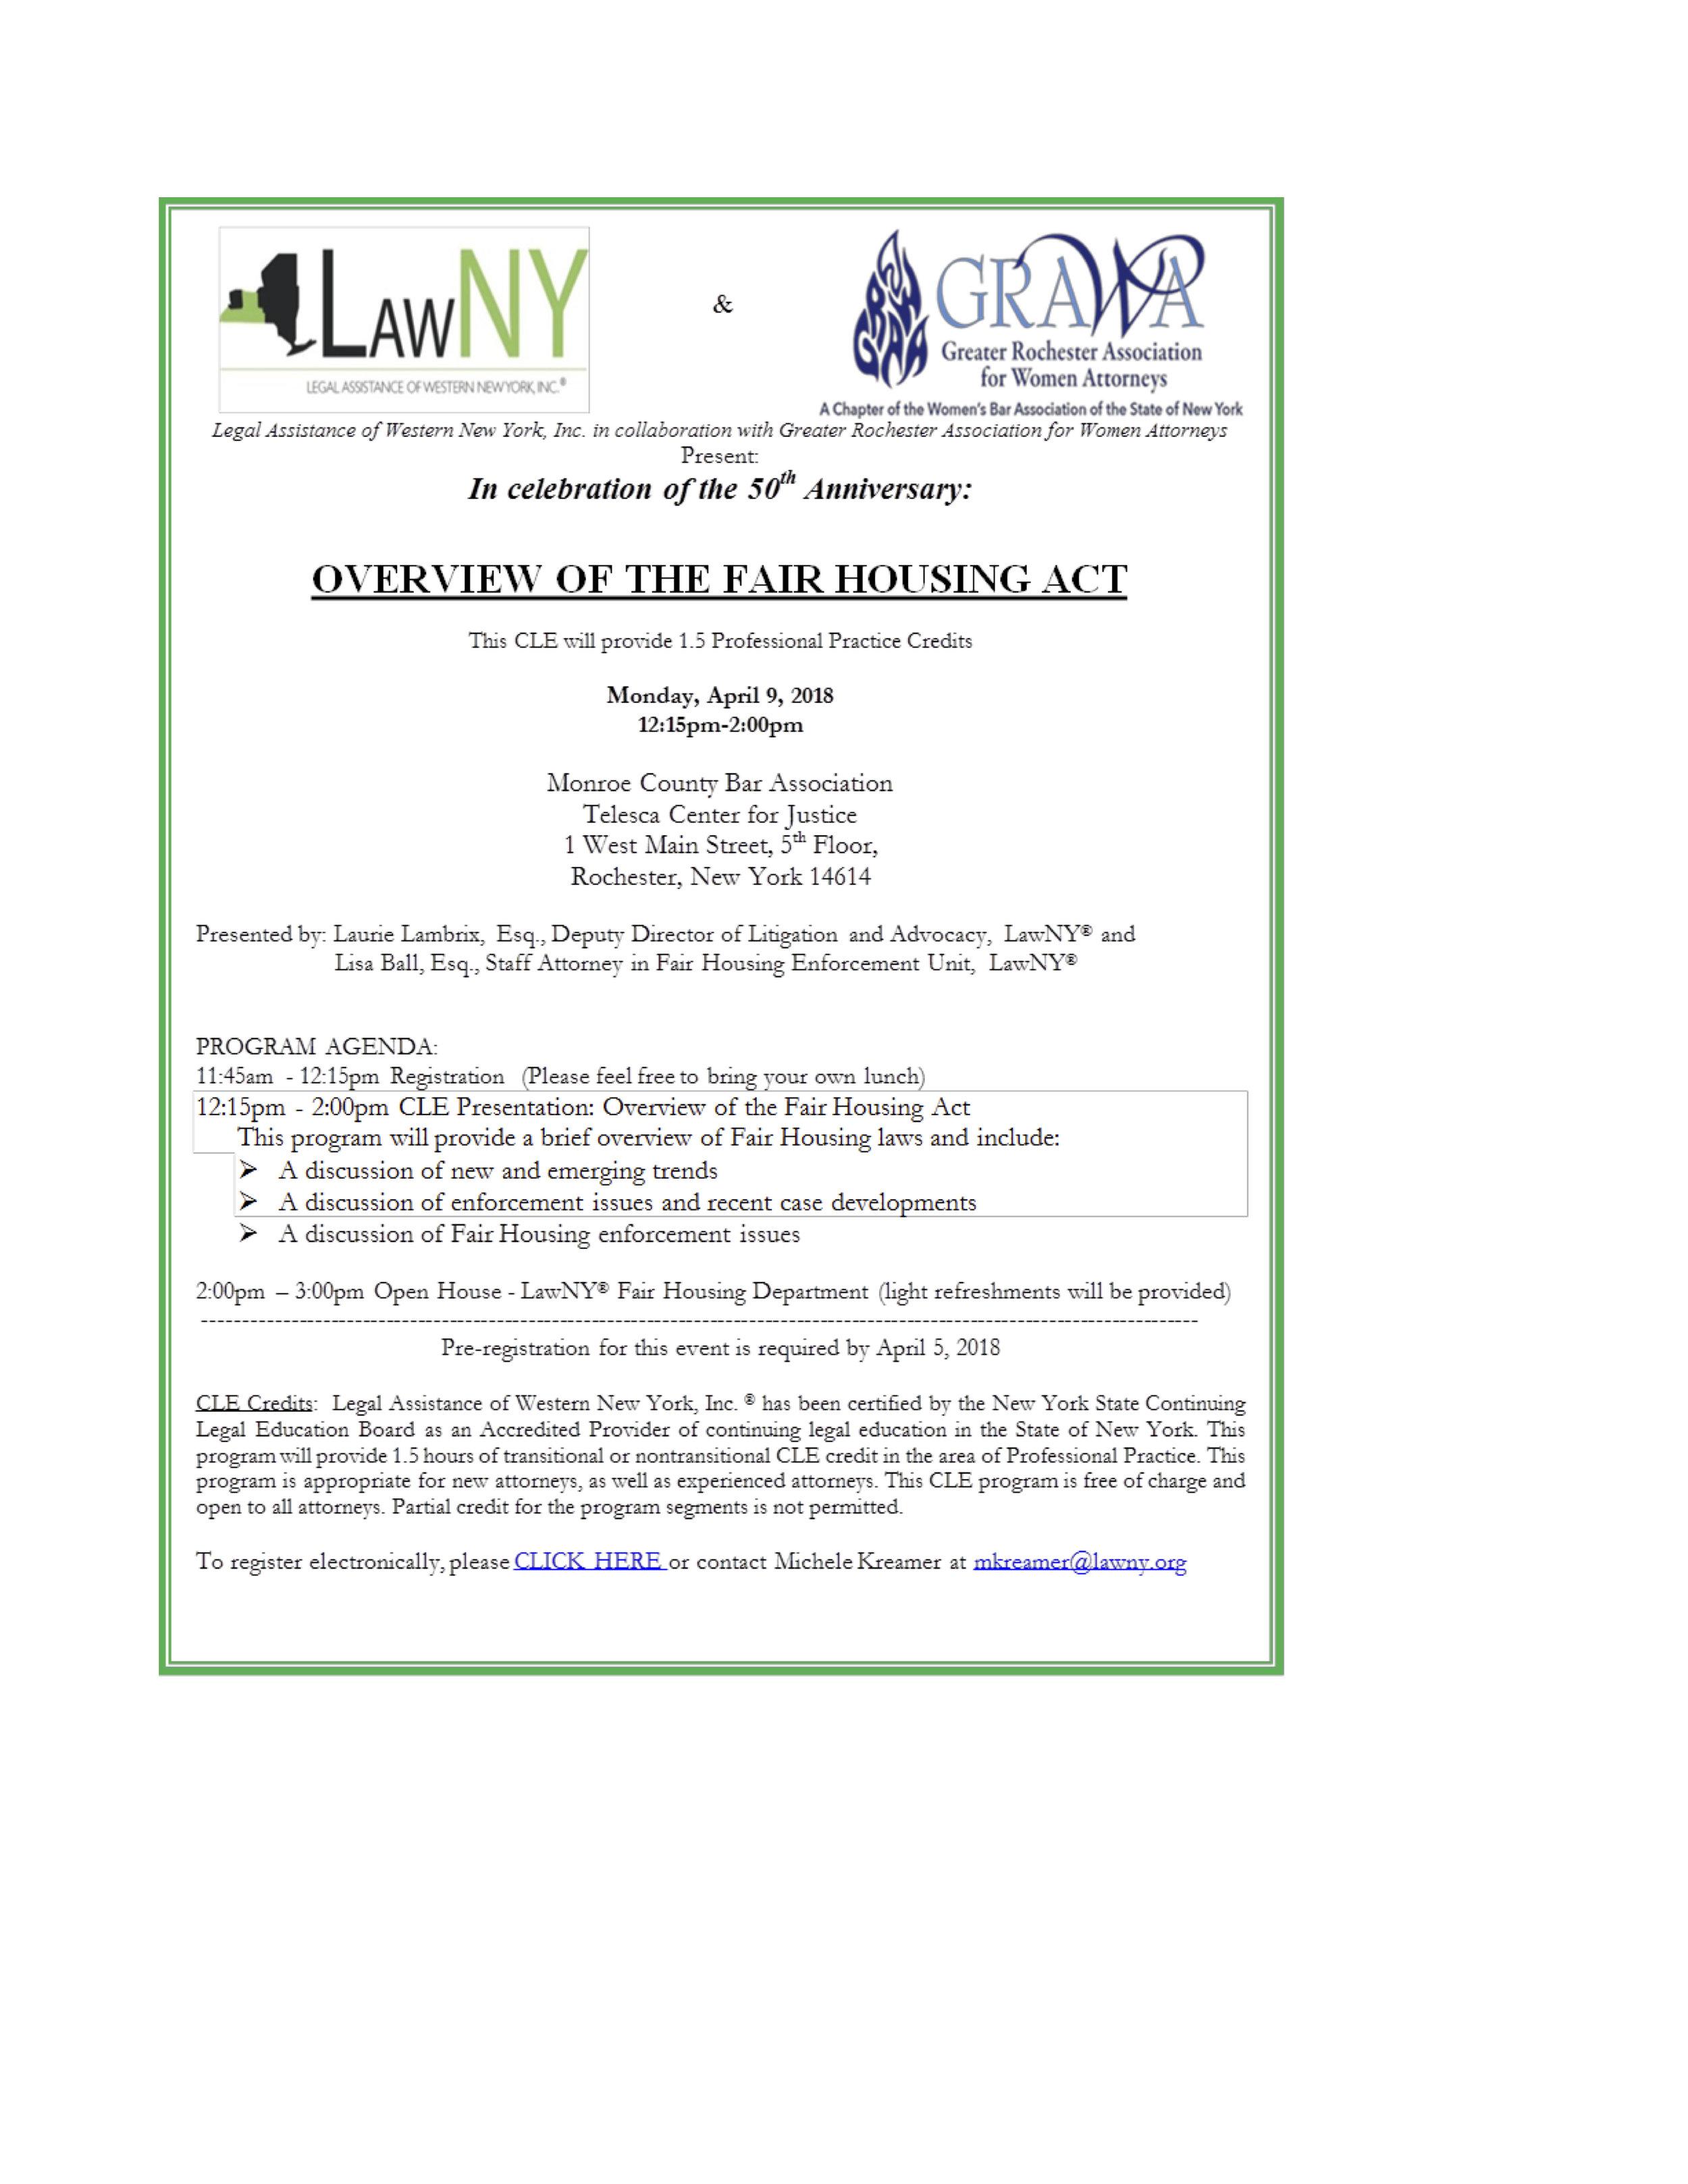 LawNY Fair Housing.jpg